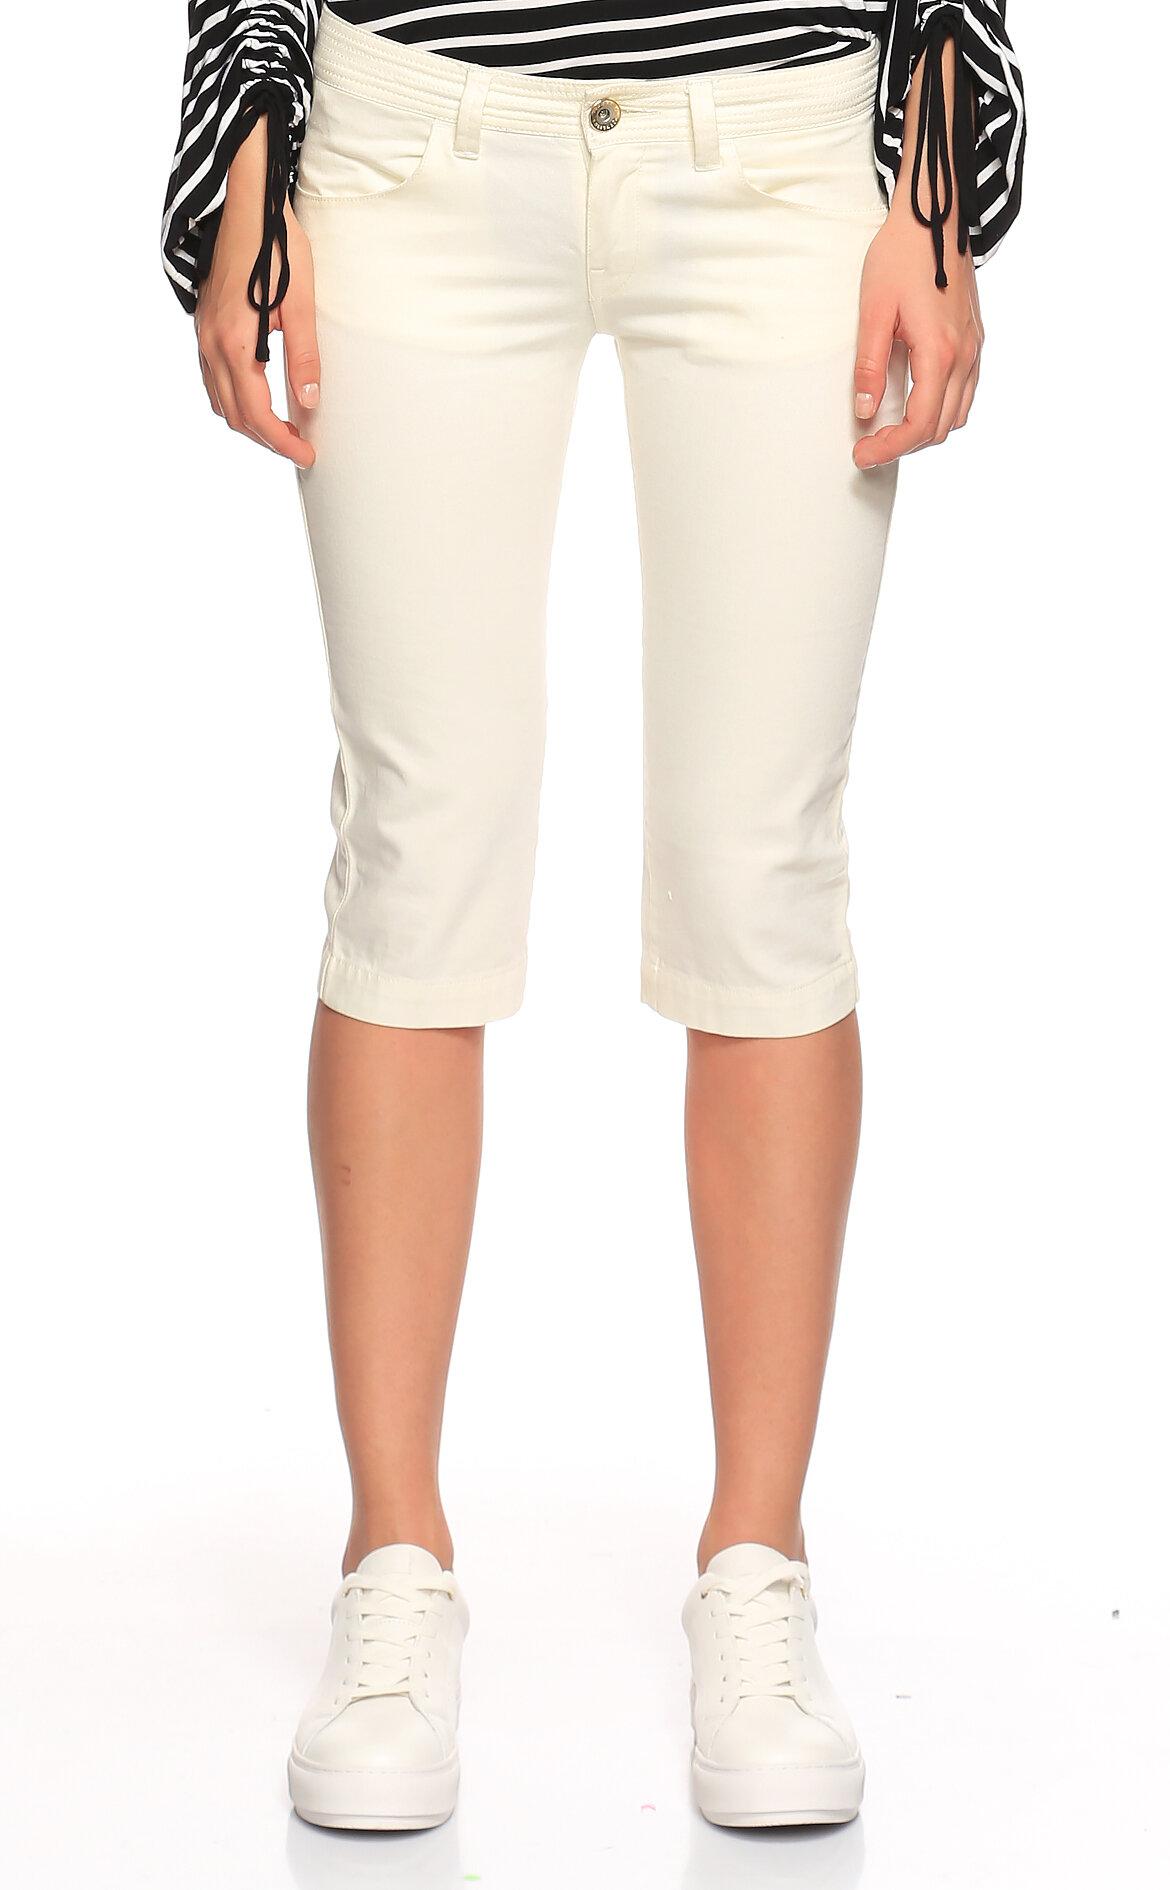 Fornarina Jeans-Fornarina Jeans Beyaz Bermuda